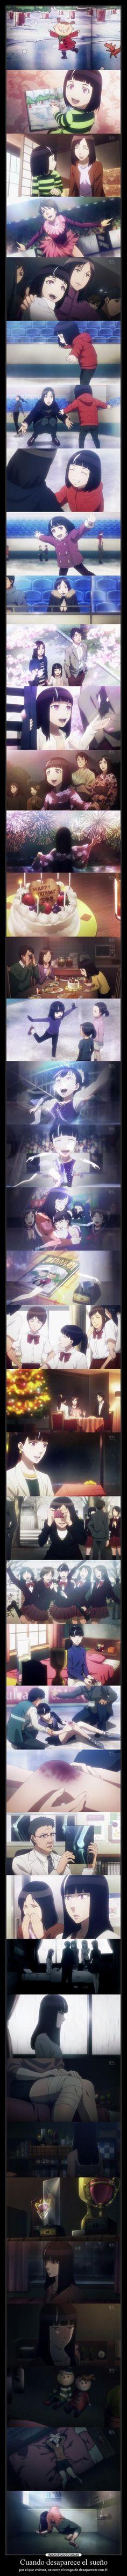 carteles muerte dolor anime raptorhunters harukaze manga deathparade death parade epicanime painanime chiyuki desmotivaciones